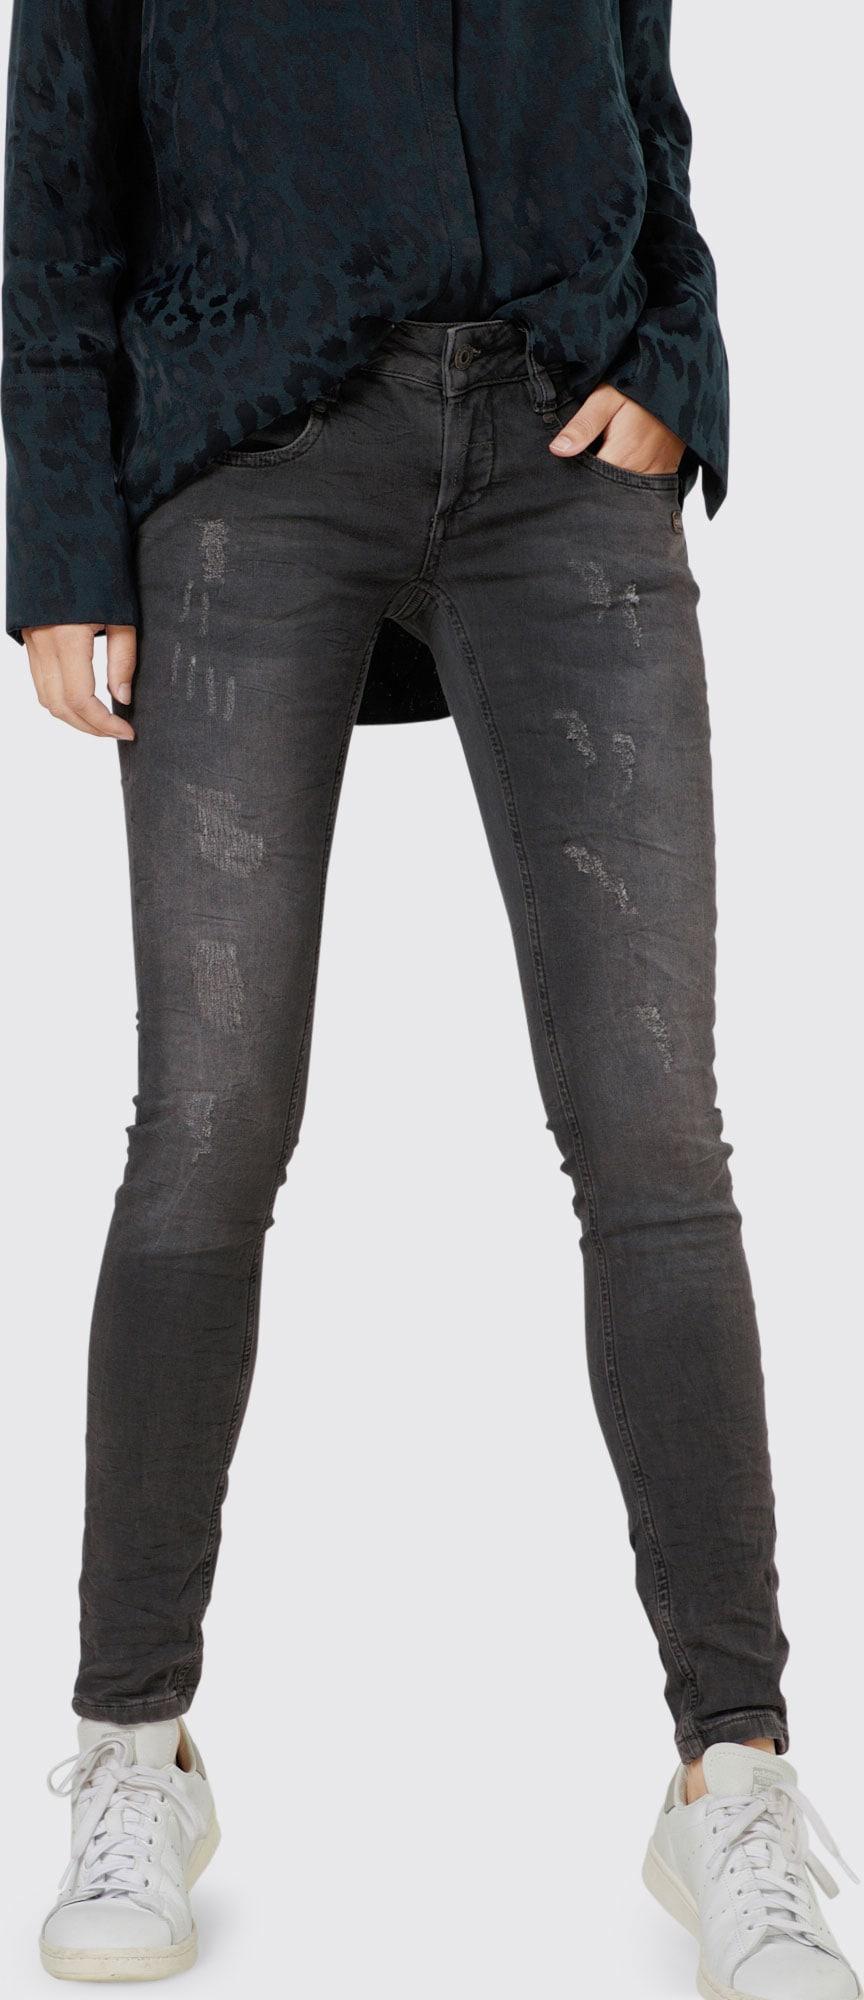 gang 39 nena 39 skinny jeans in grau about you. Black Bedroom Furniture Sets. Home Design Ideas